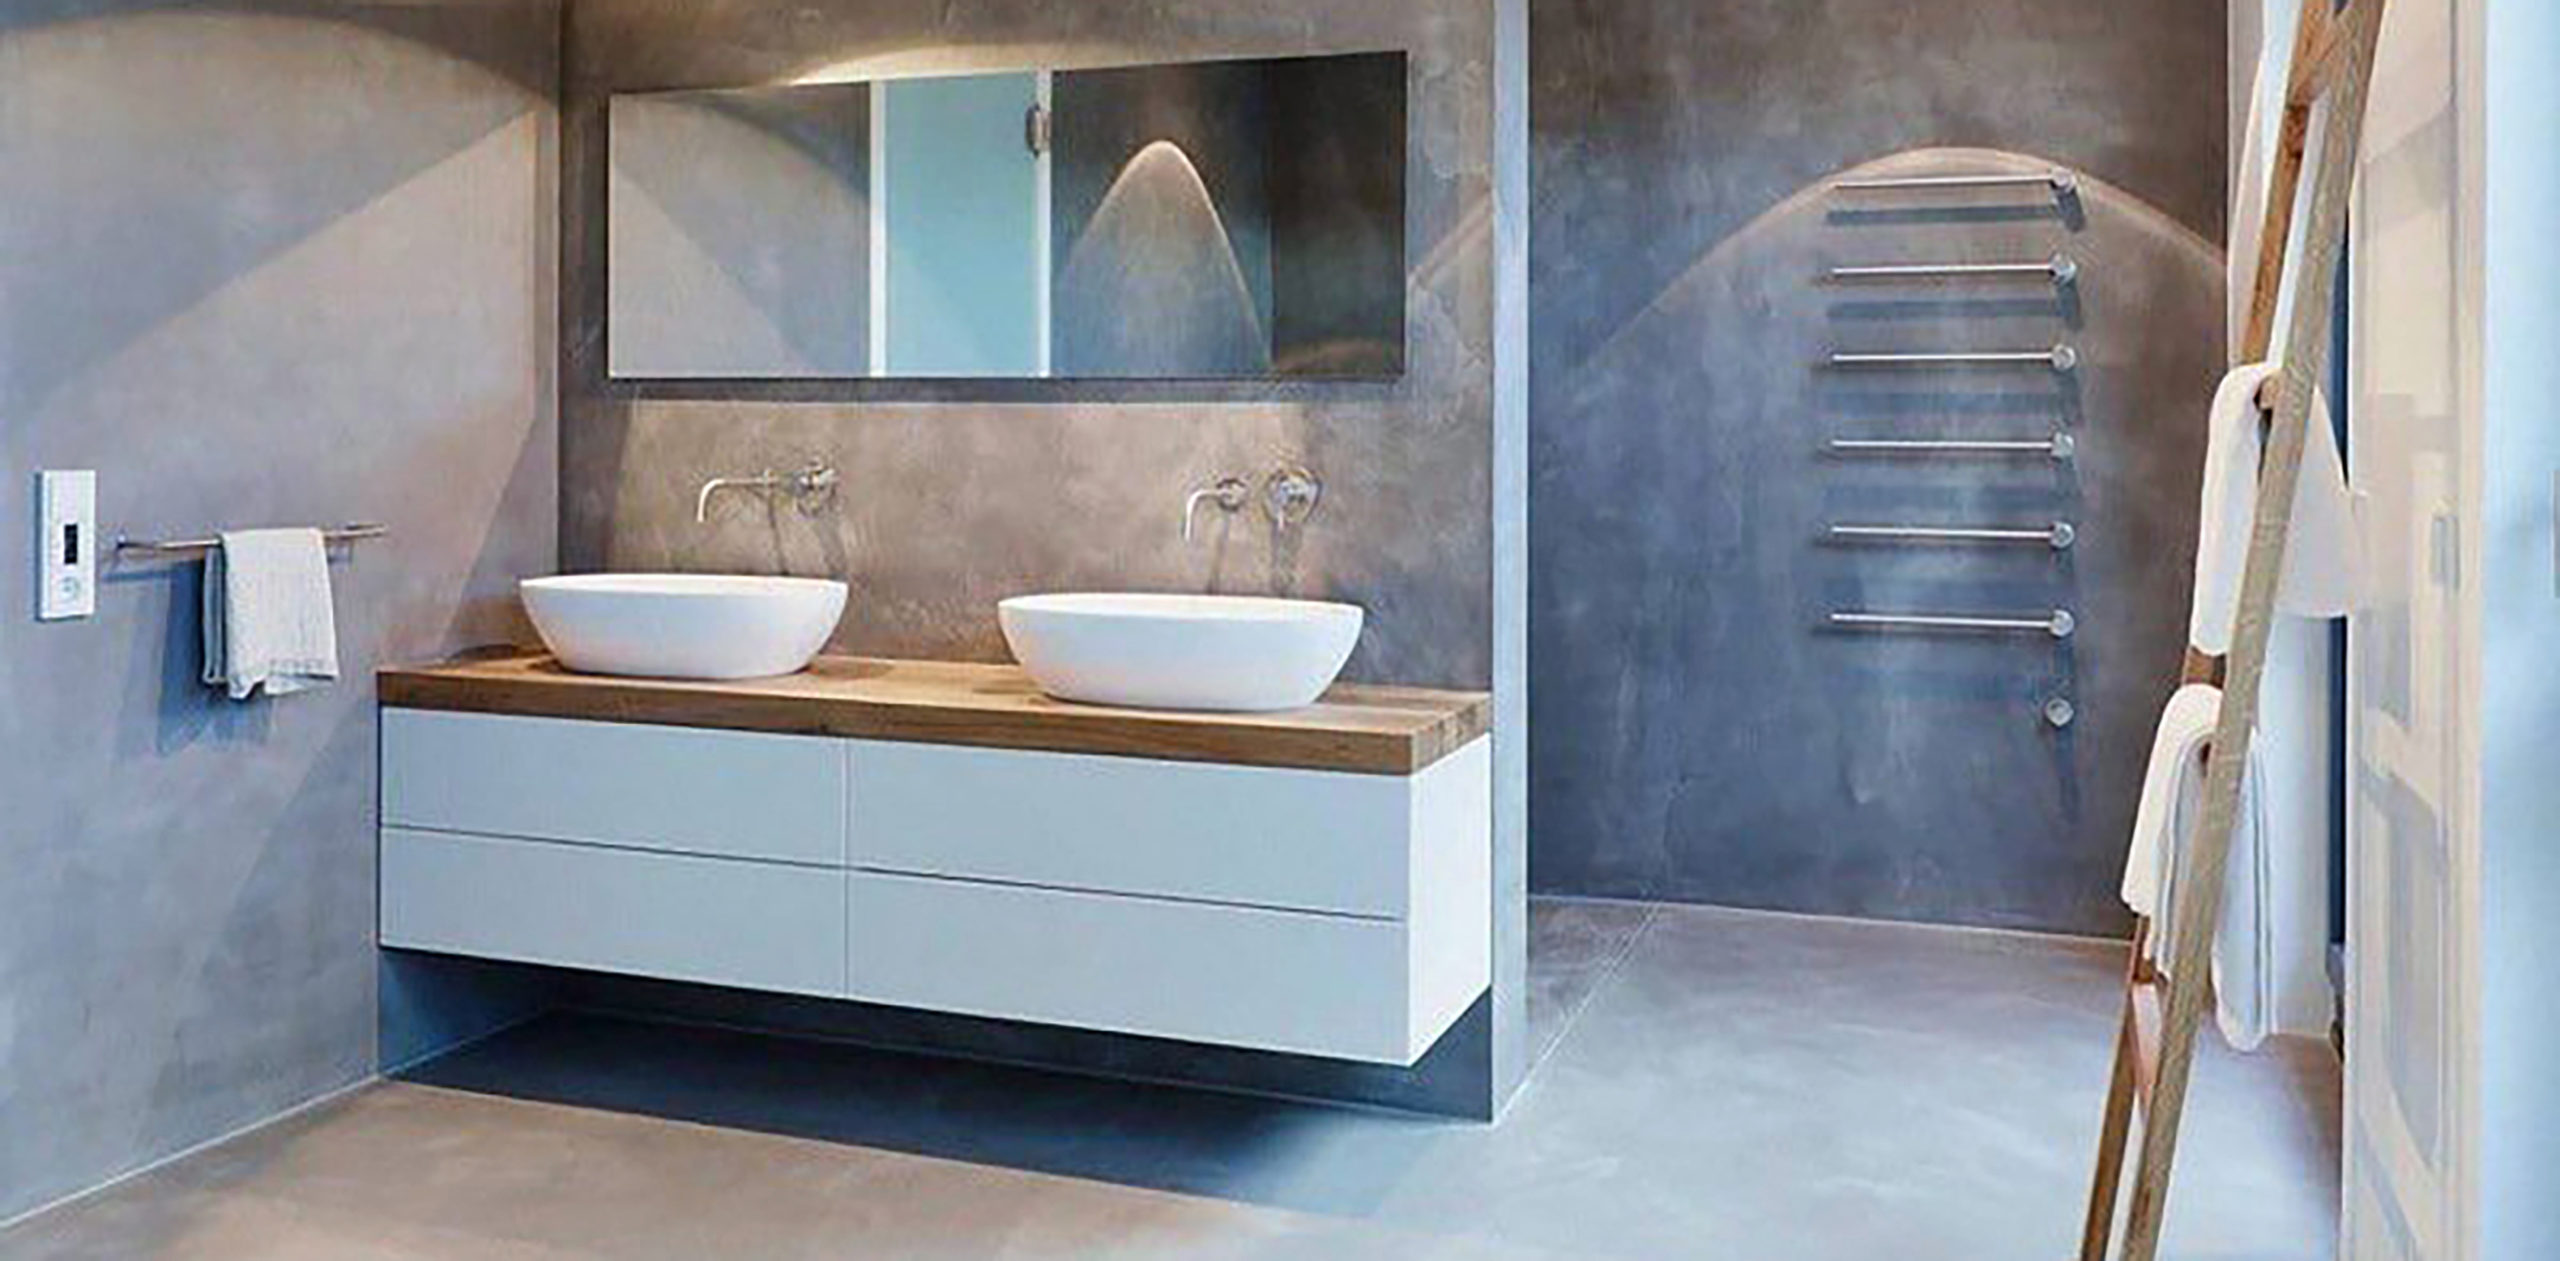 Salle de bain Käslin sanitaires SA